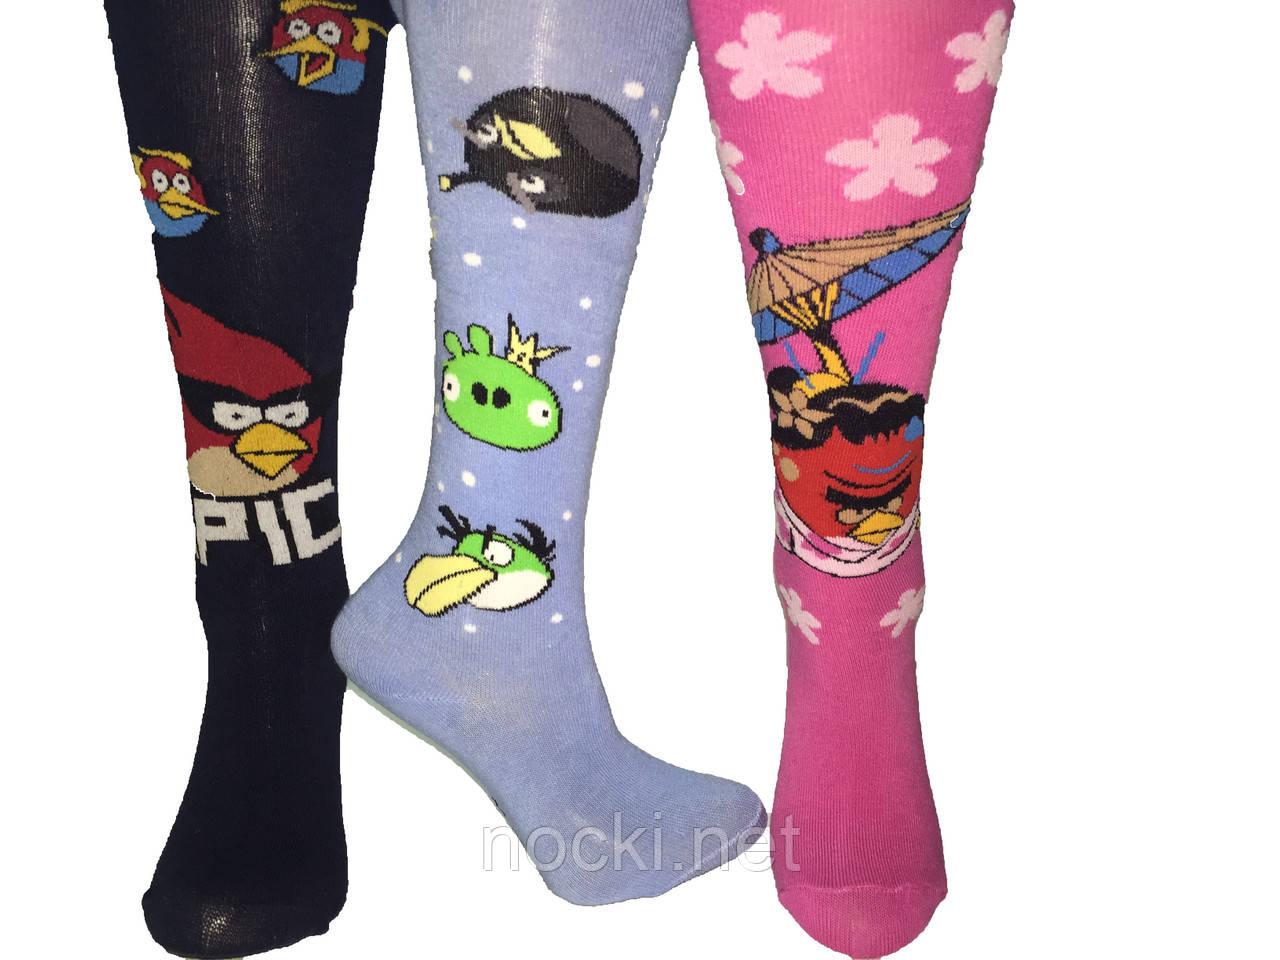 "Колготки детские хлопок Шугуан ""Angry Birds"" рост 92-98"